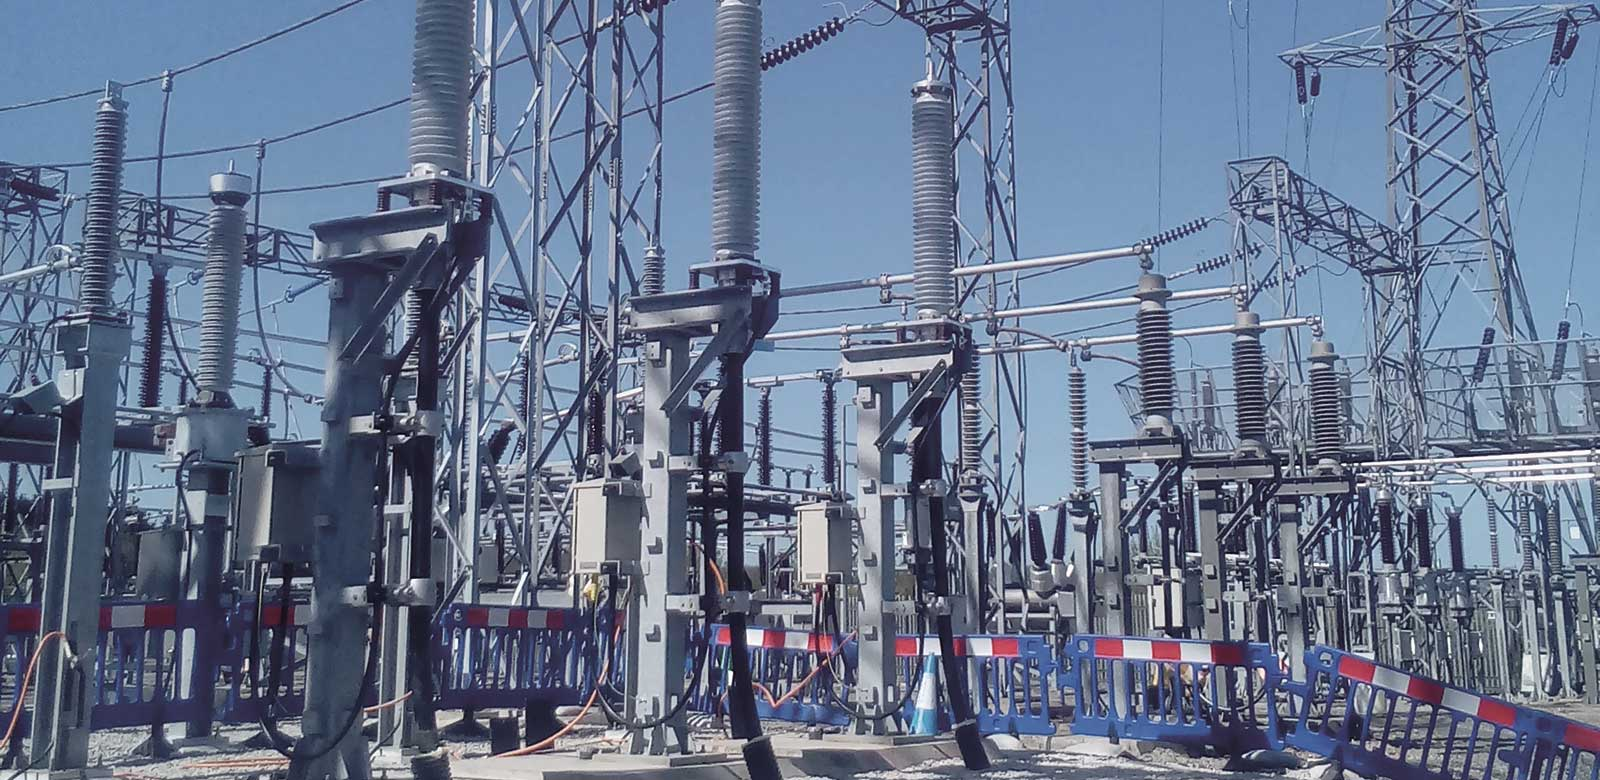 PN Daly Transmission